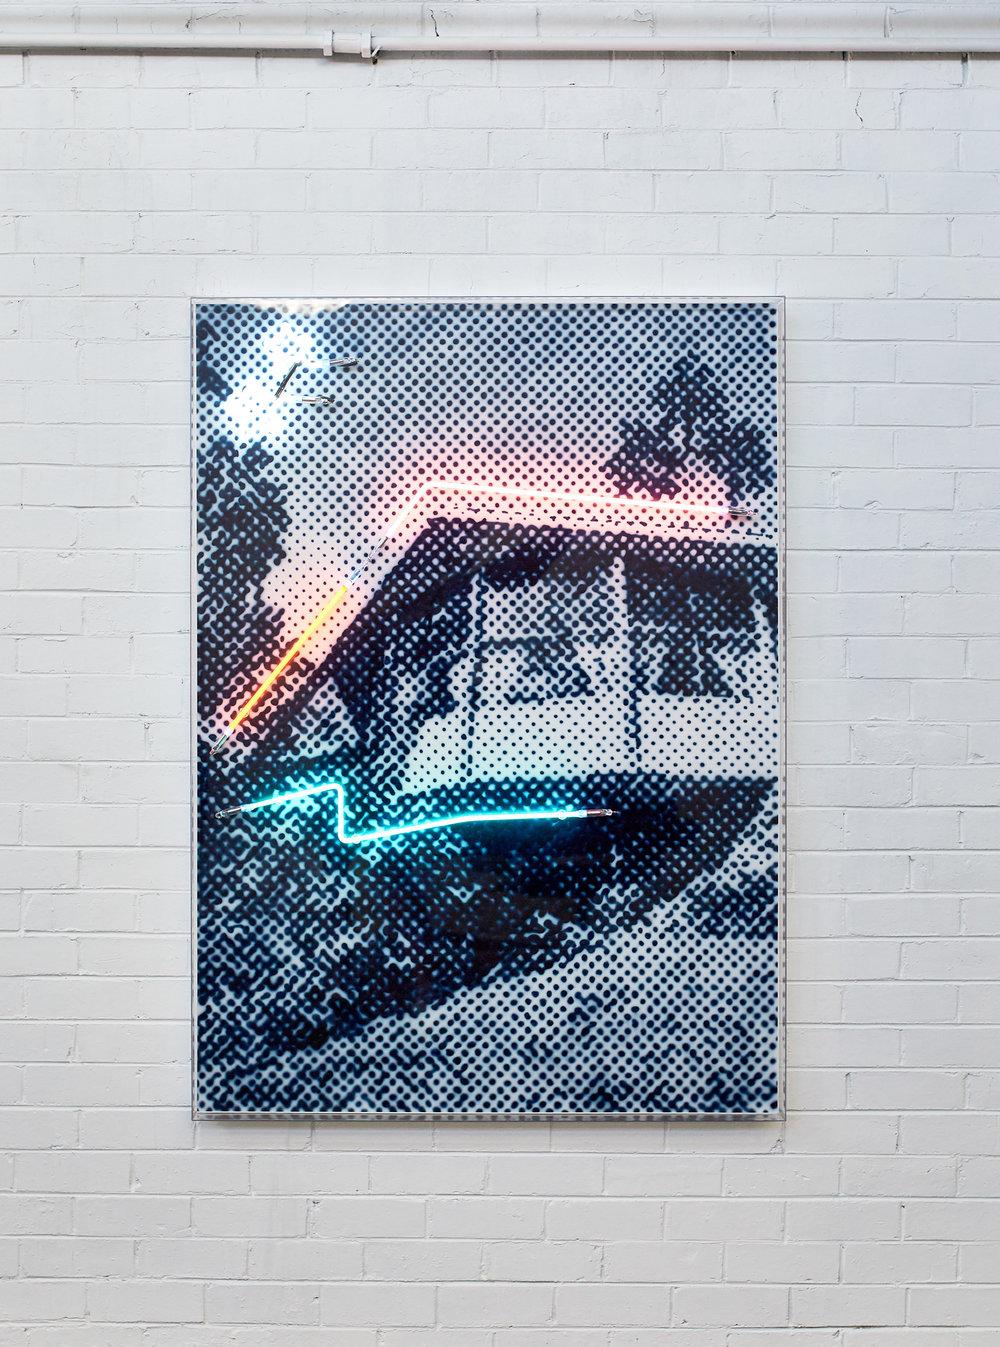 House of tomorrow  Airbrush acrylic polymer and neon on dibond, acrylic frame 115x160cm